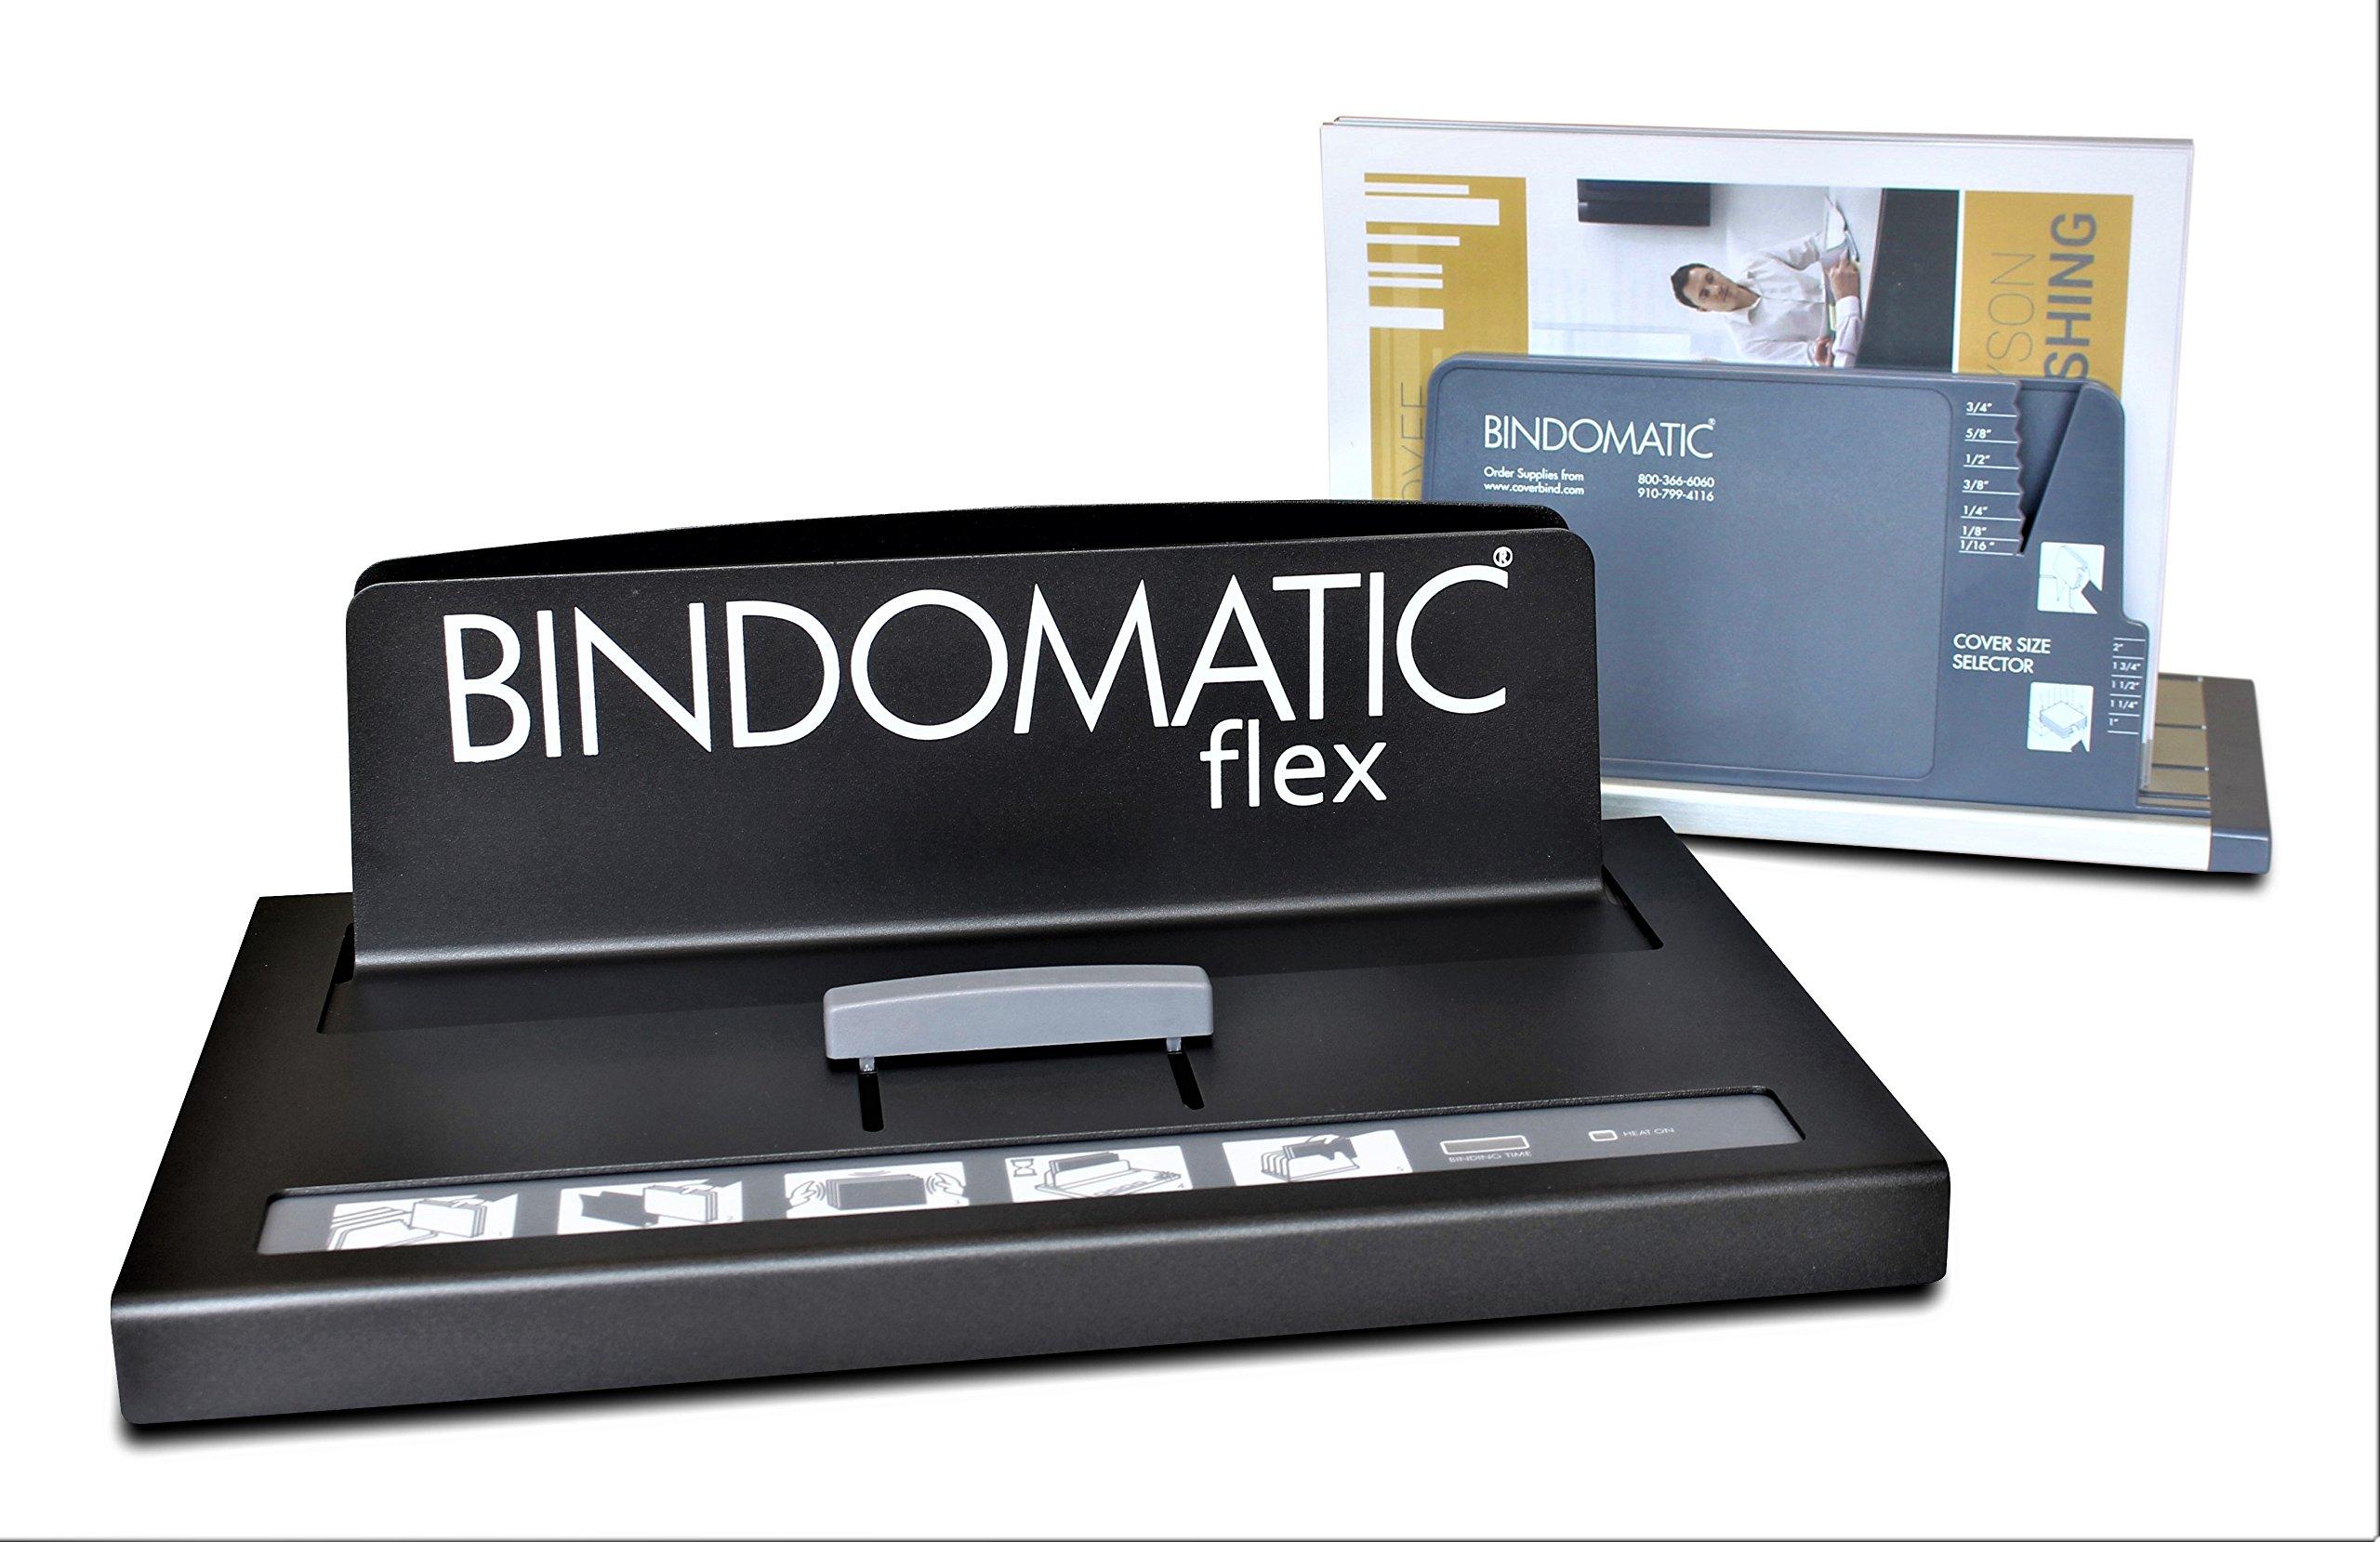 CoverBind: Bindomatic Accel Flex Thermal Binding Machine by Bindomatic